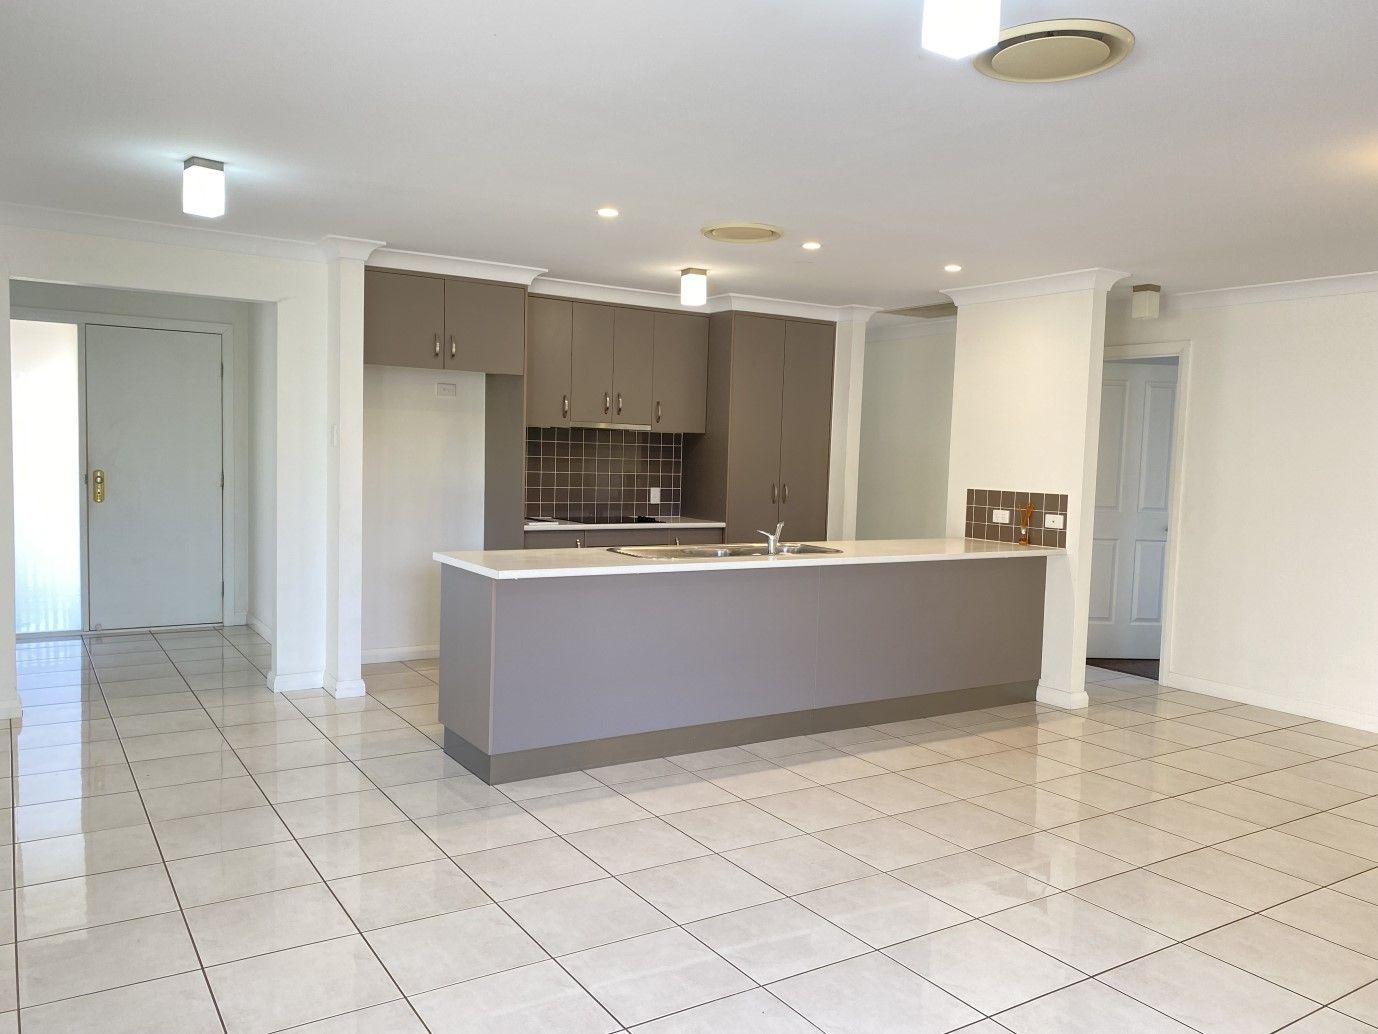 79 Sommerfeld Crescent, Chinchilla QLD 4413, Image 2